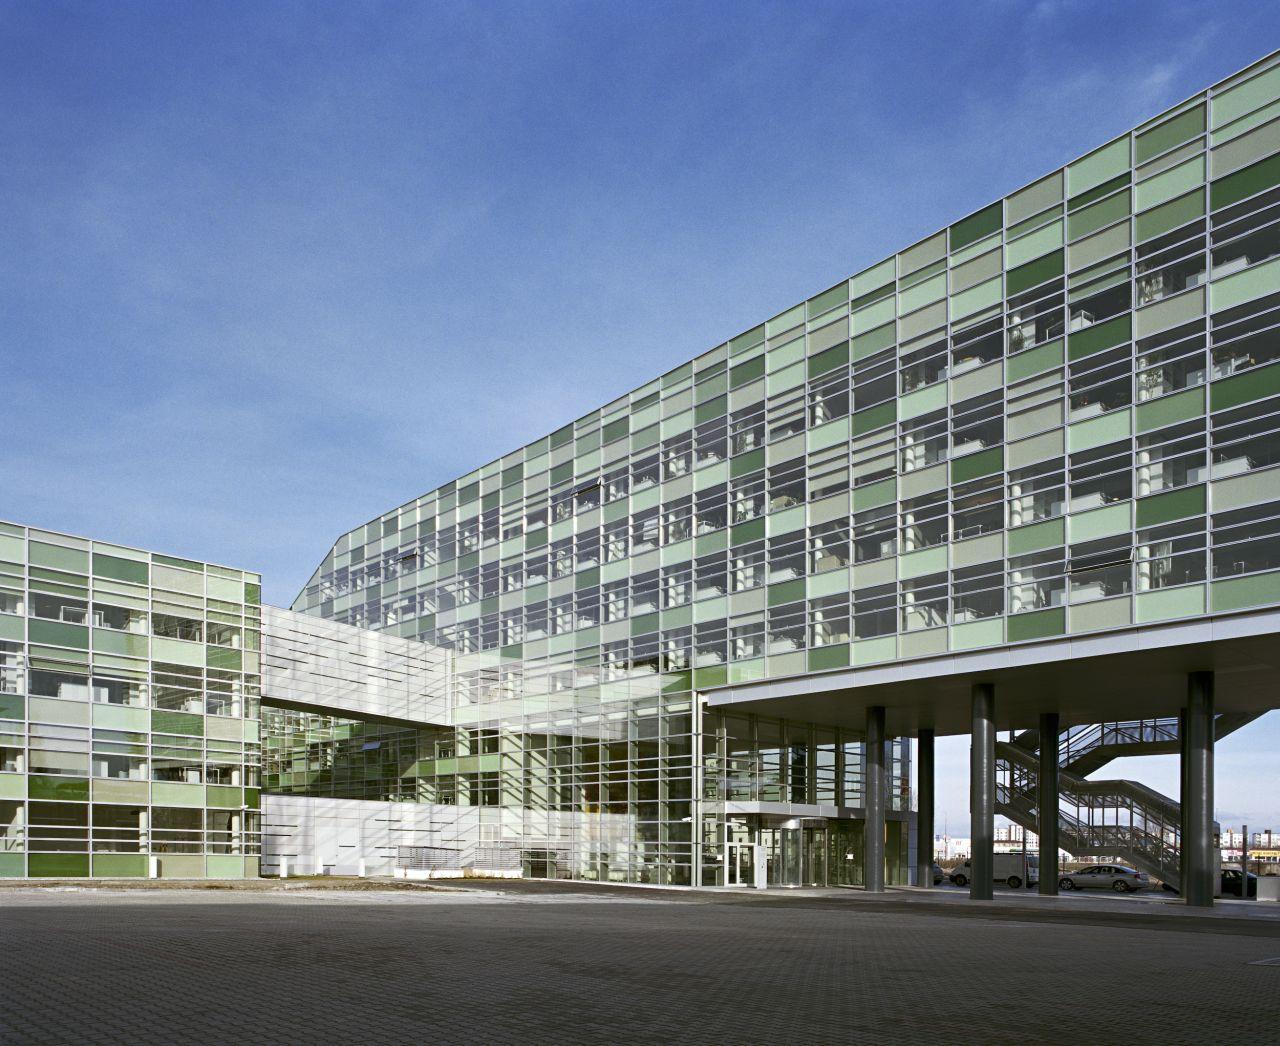 SKC Bratislava / MHM architects, © Herta Hurnaus